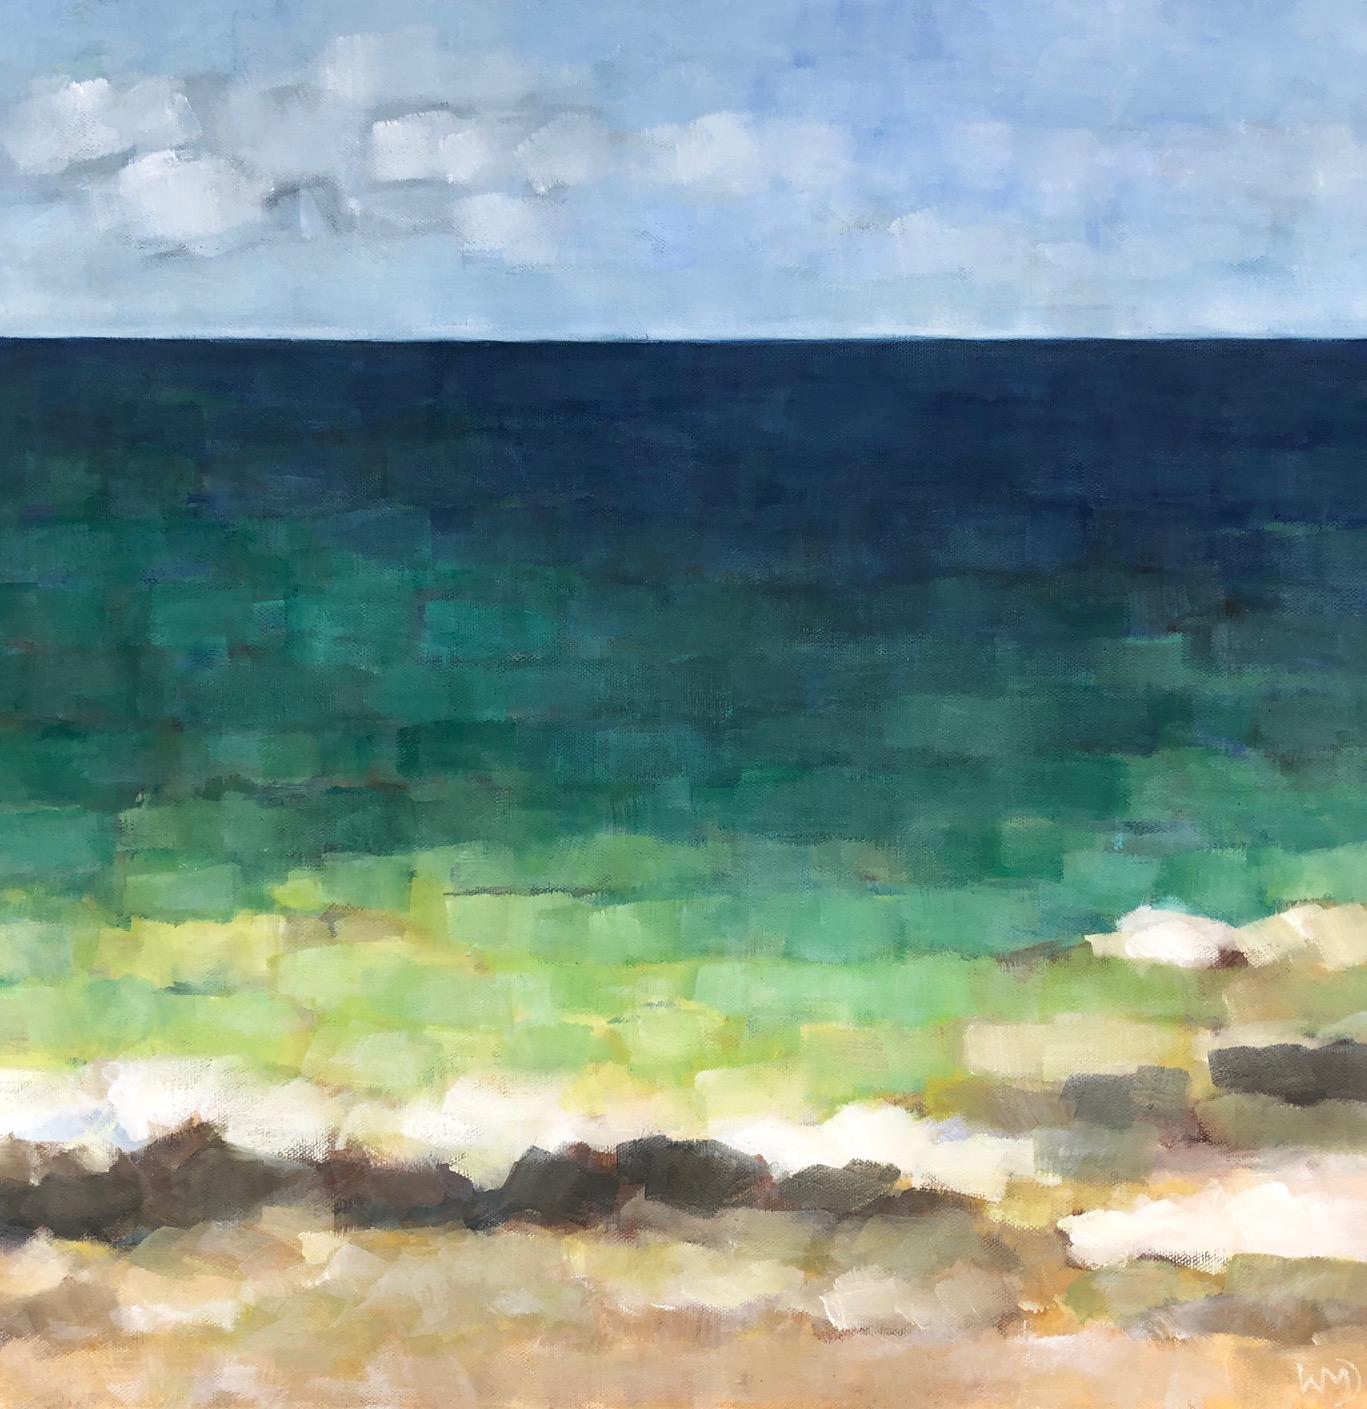 Ocean commission - 2017